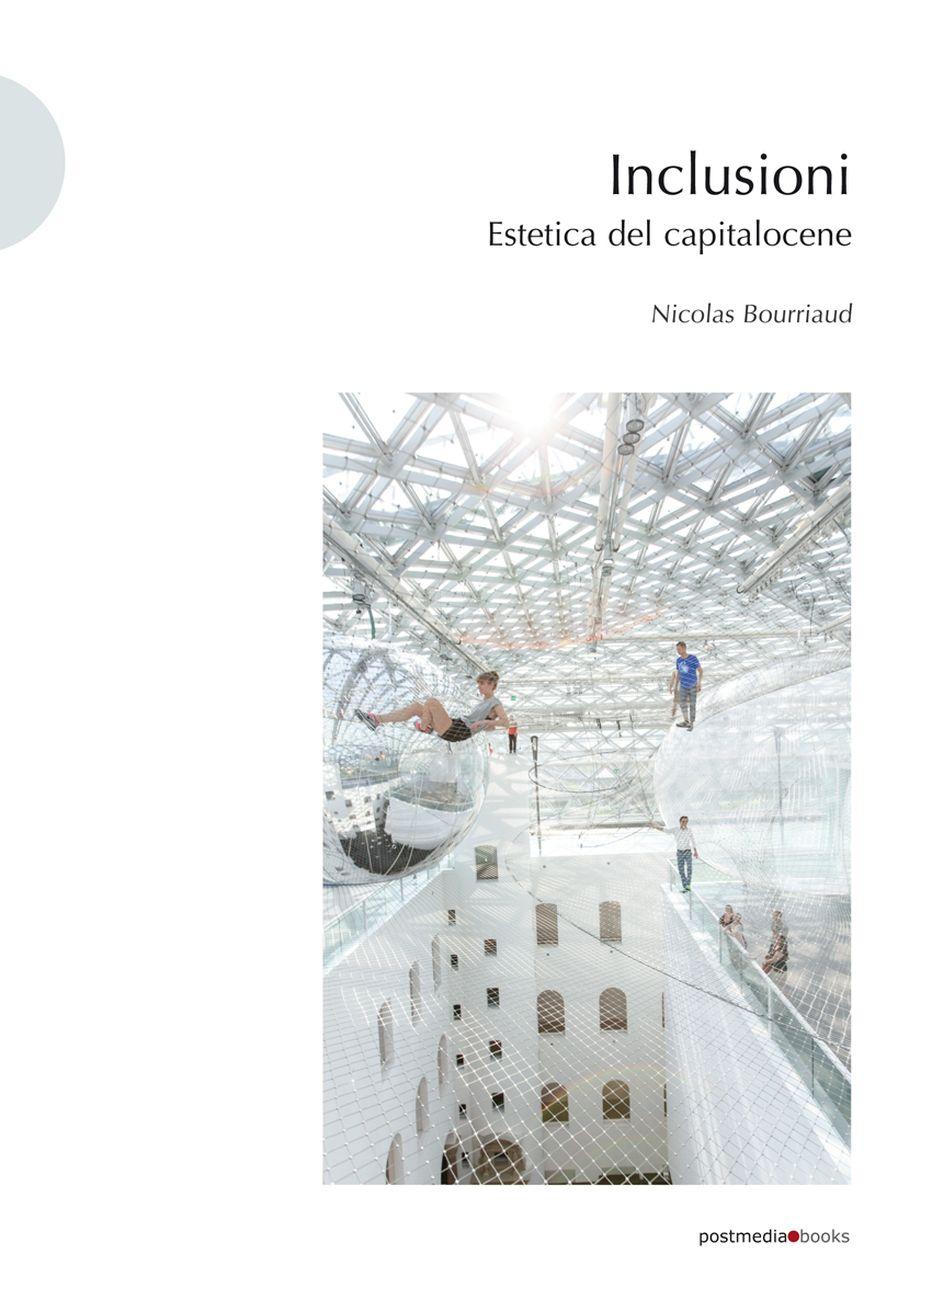 Nicolas Bourriaud – Inclusioni. Estetica del capitalocene (Postmedia Books, Milano 2020)